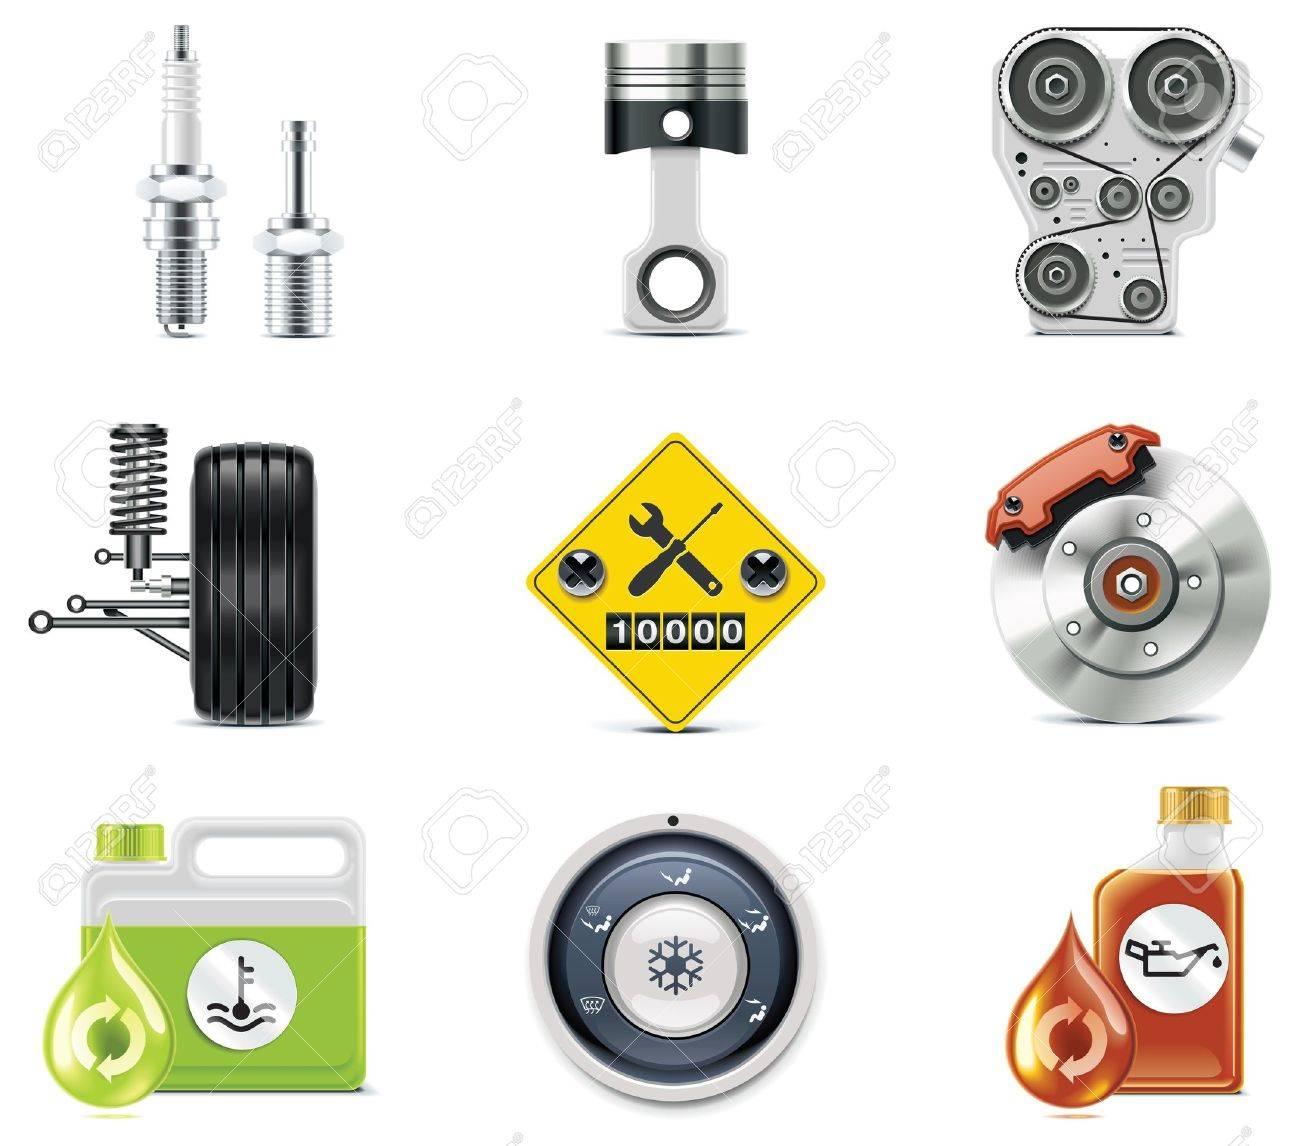 Car service icons. Stock Vector - 8116628